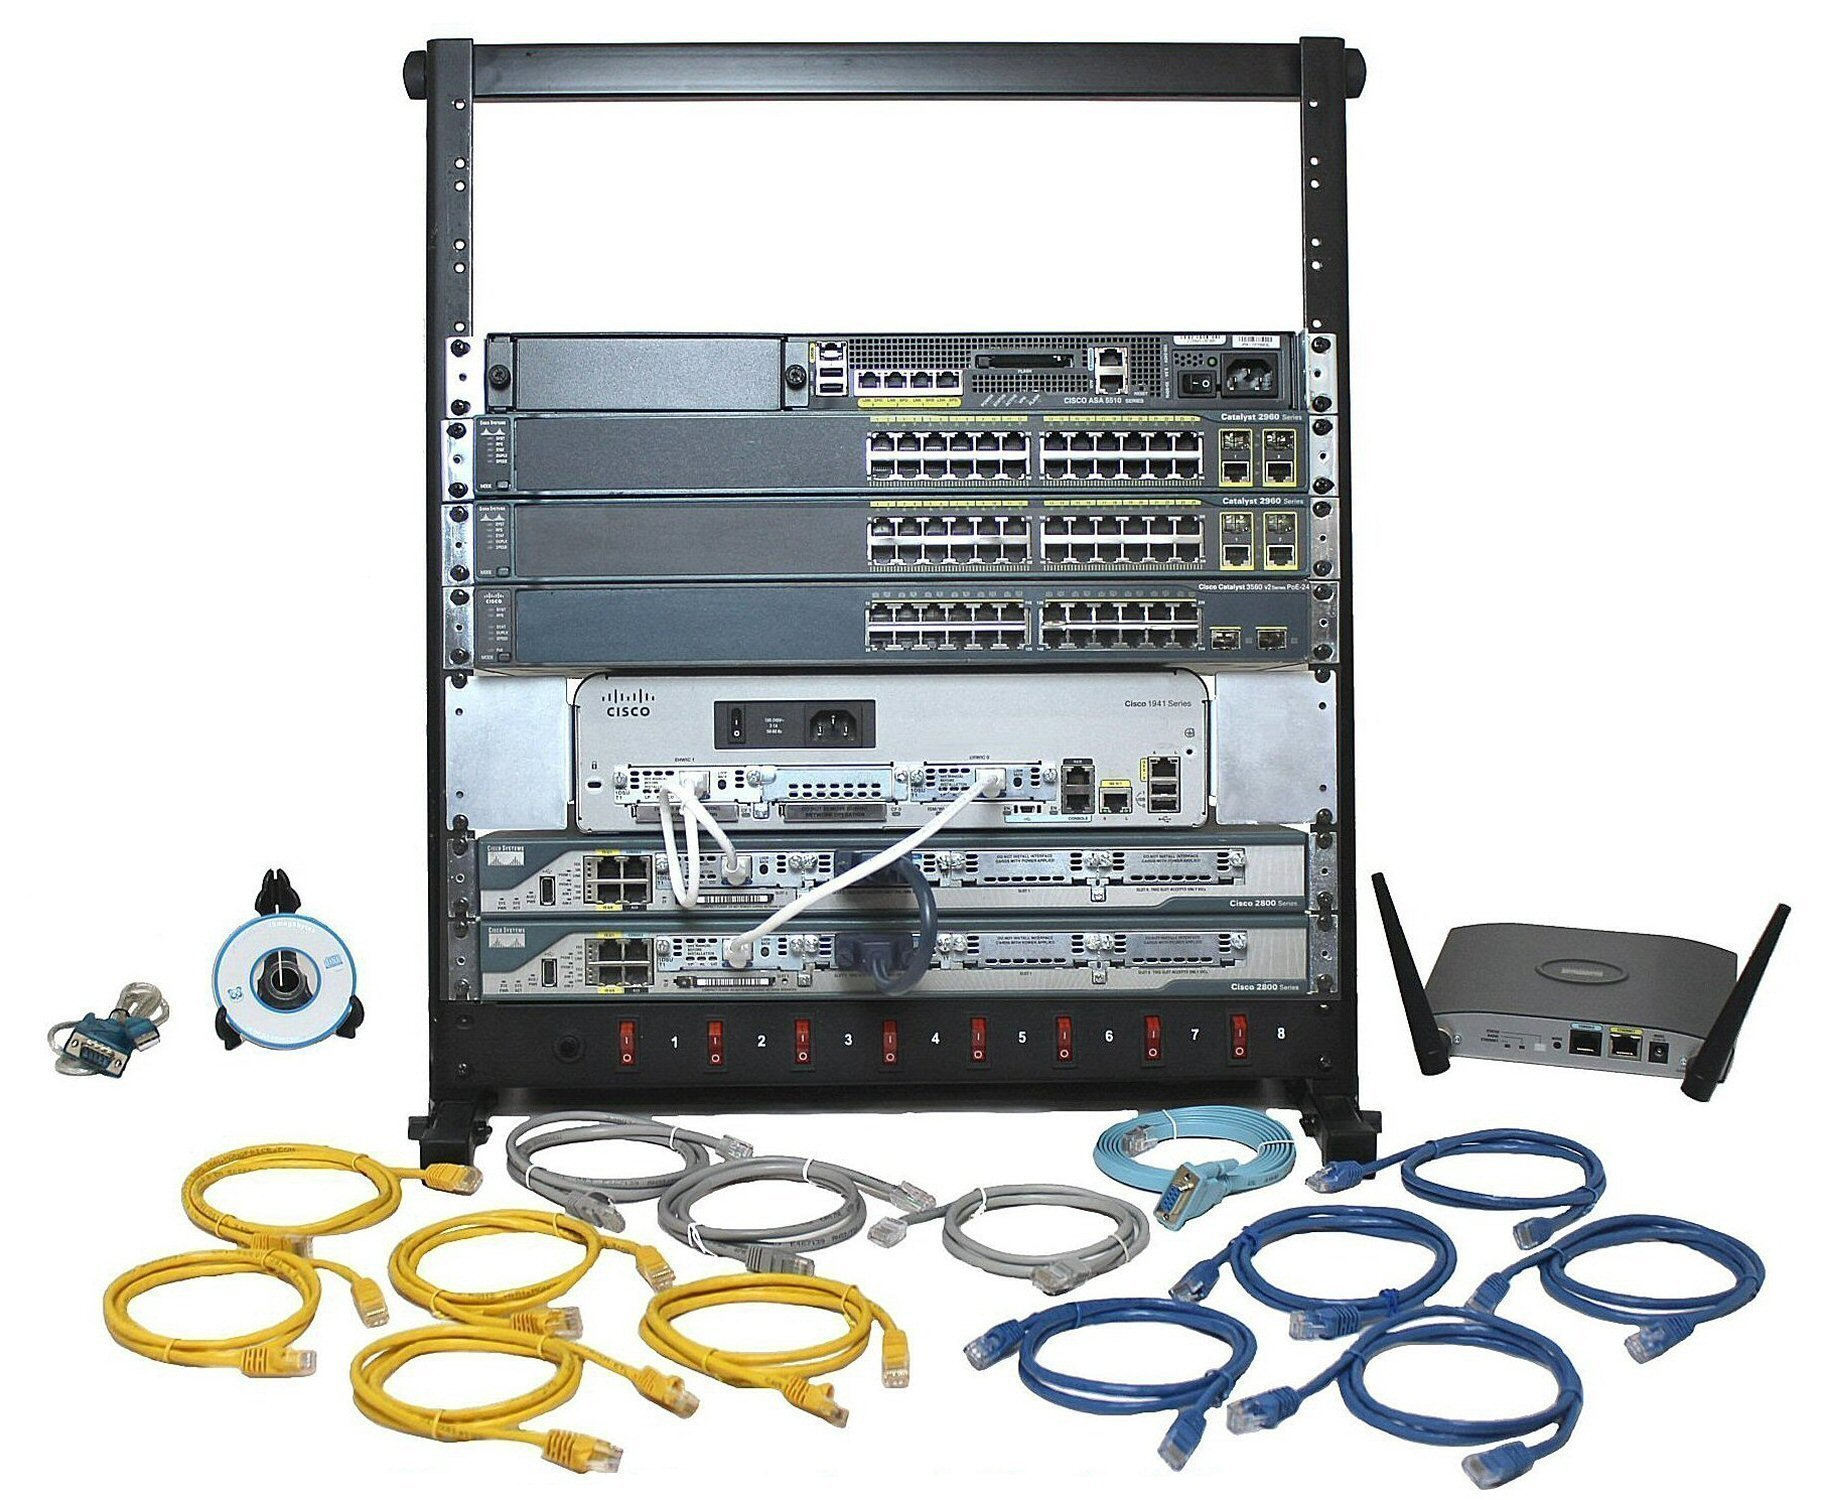 CCNA Security Standard Lab Kit v4